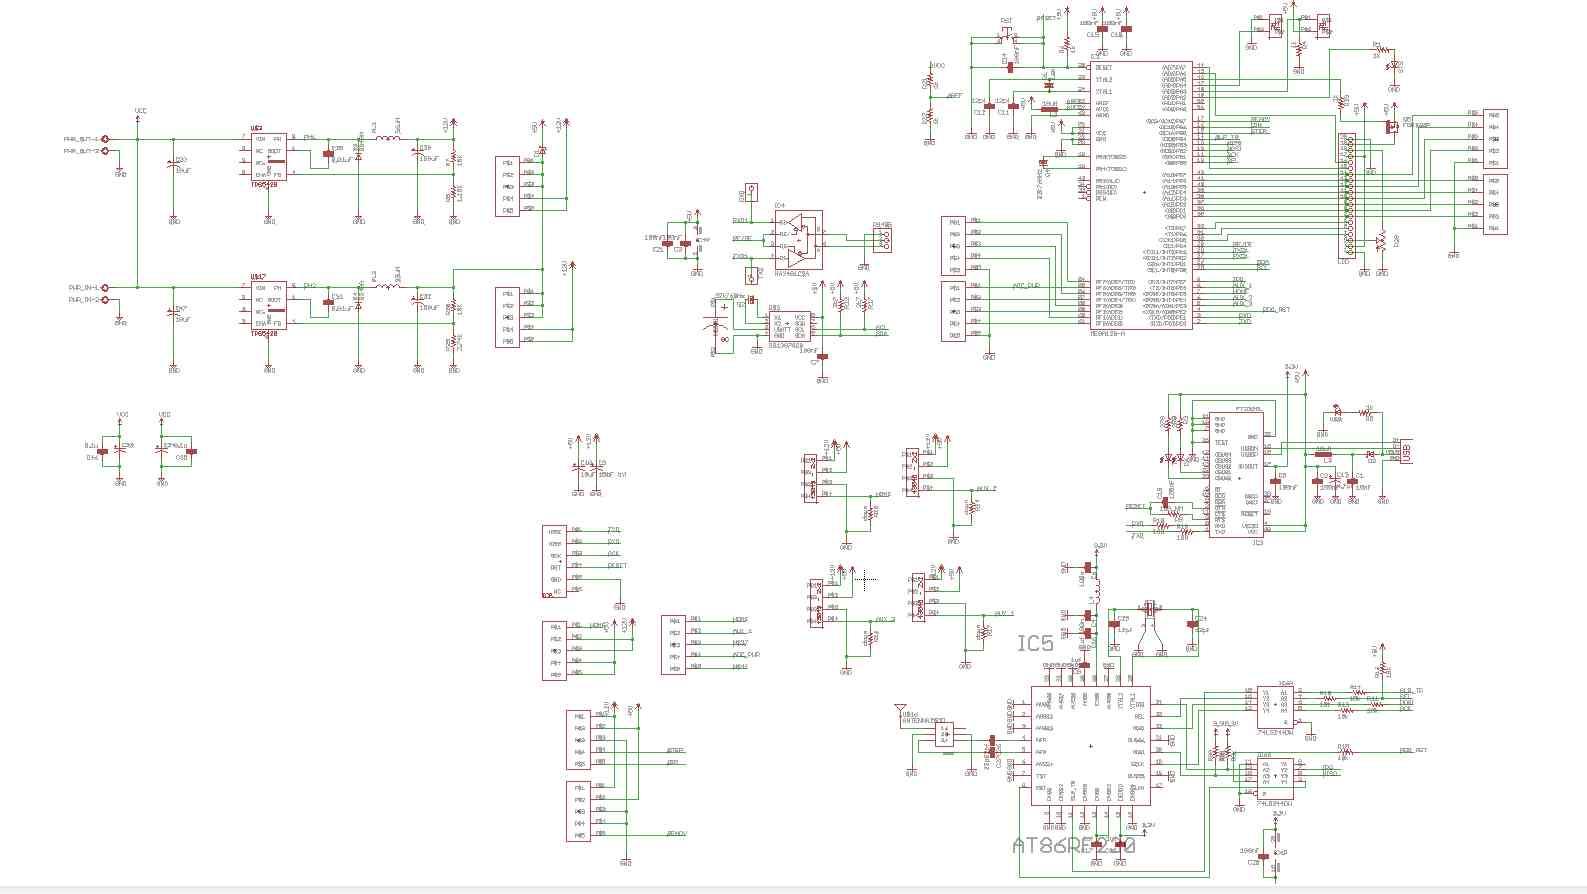 krazatchu design systems  u00bb arduino proto board